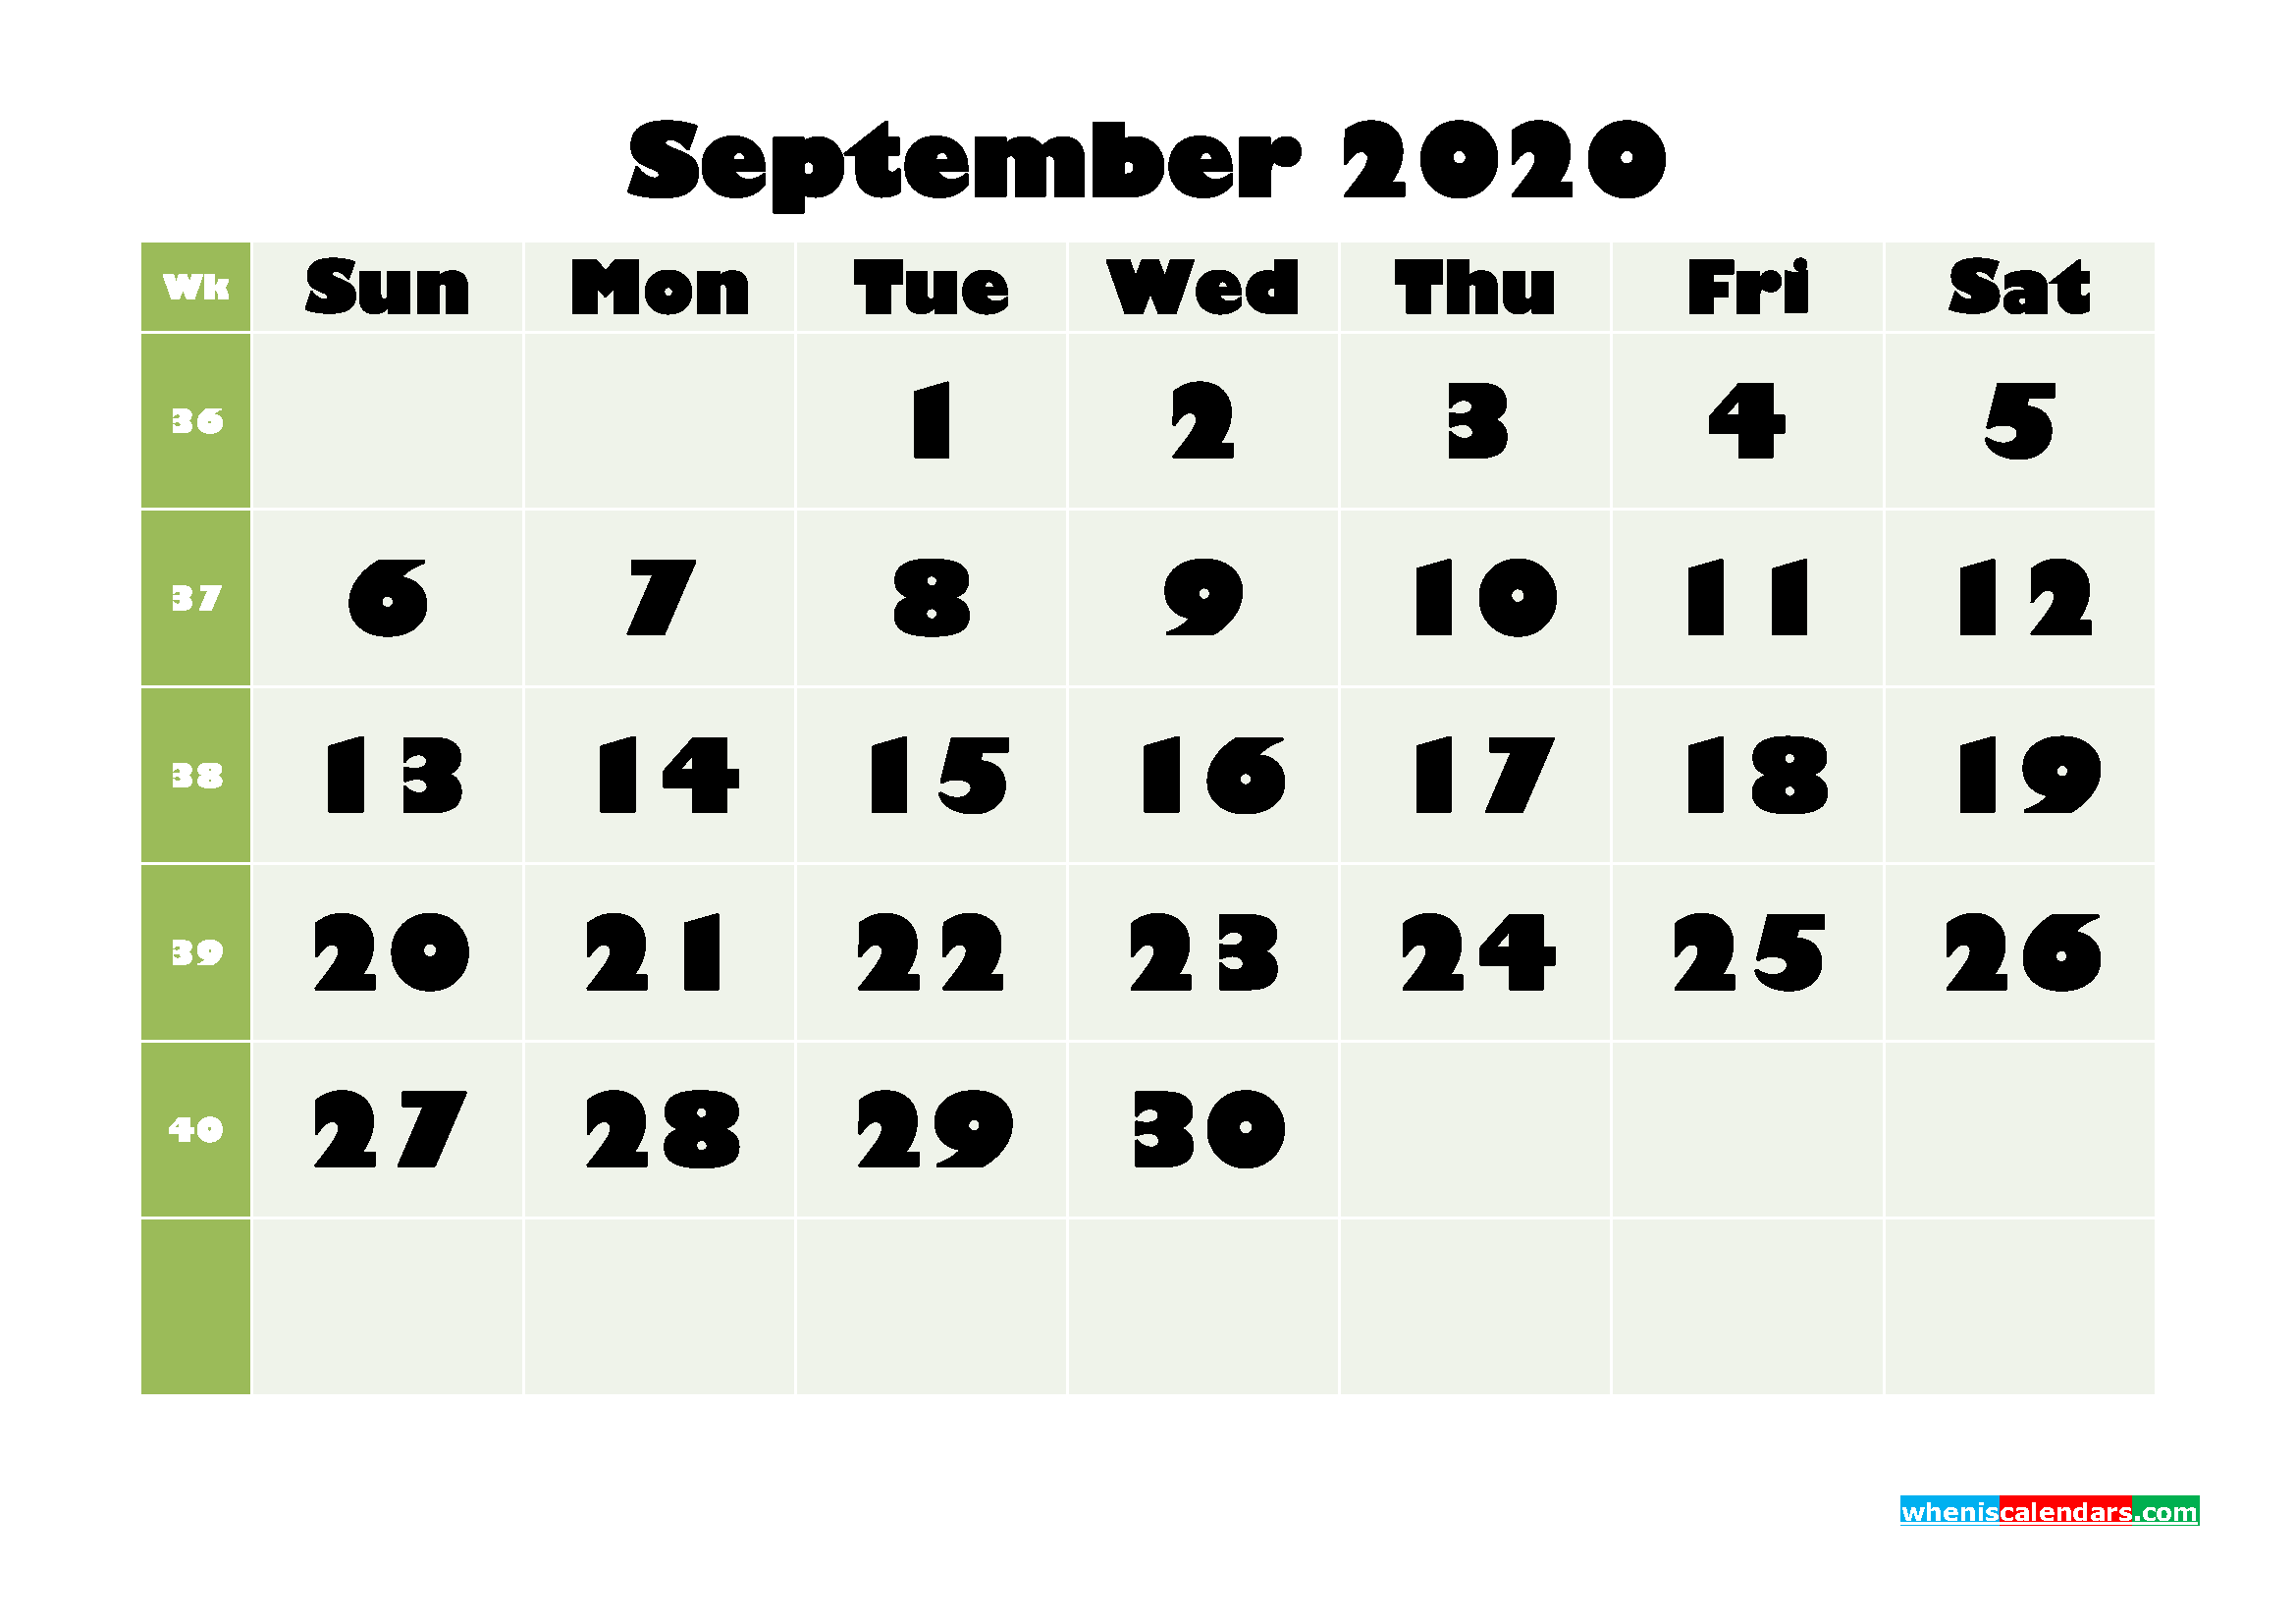 September Printable Calendar 2020 PDF, Word - No.m20b669